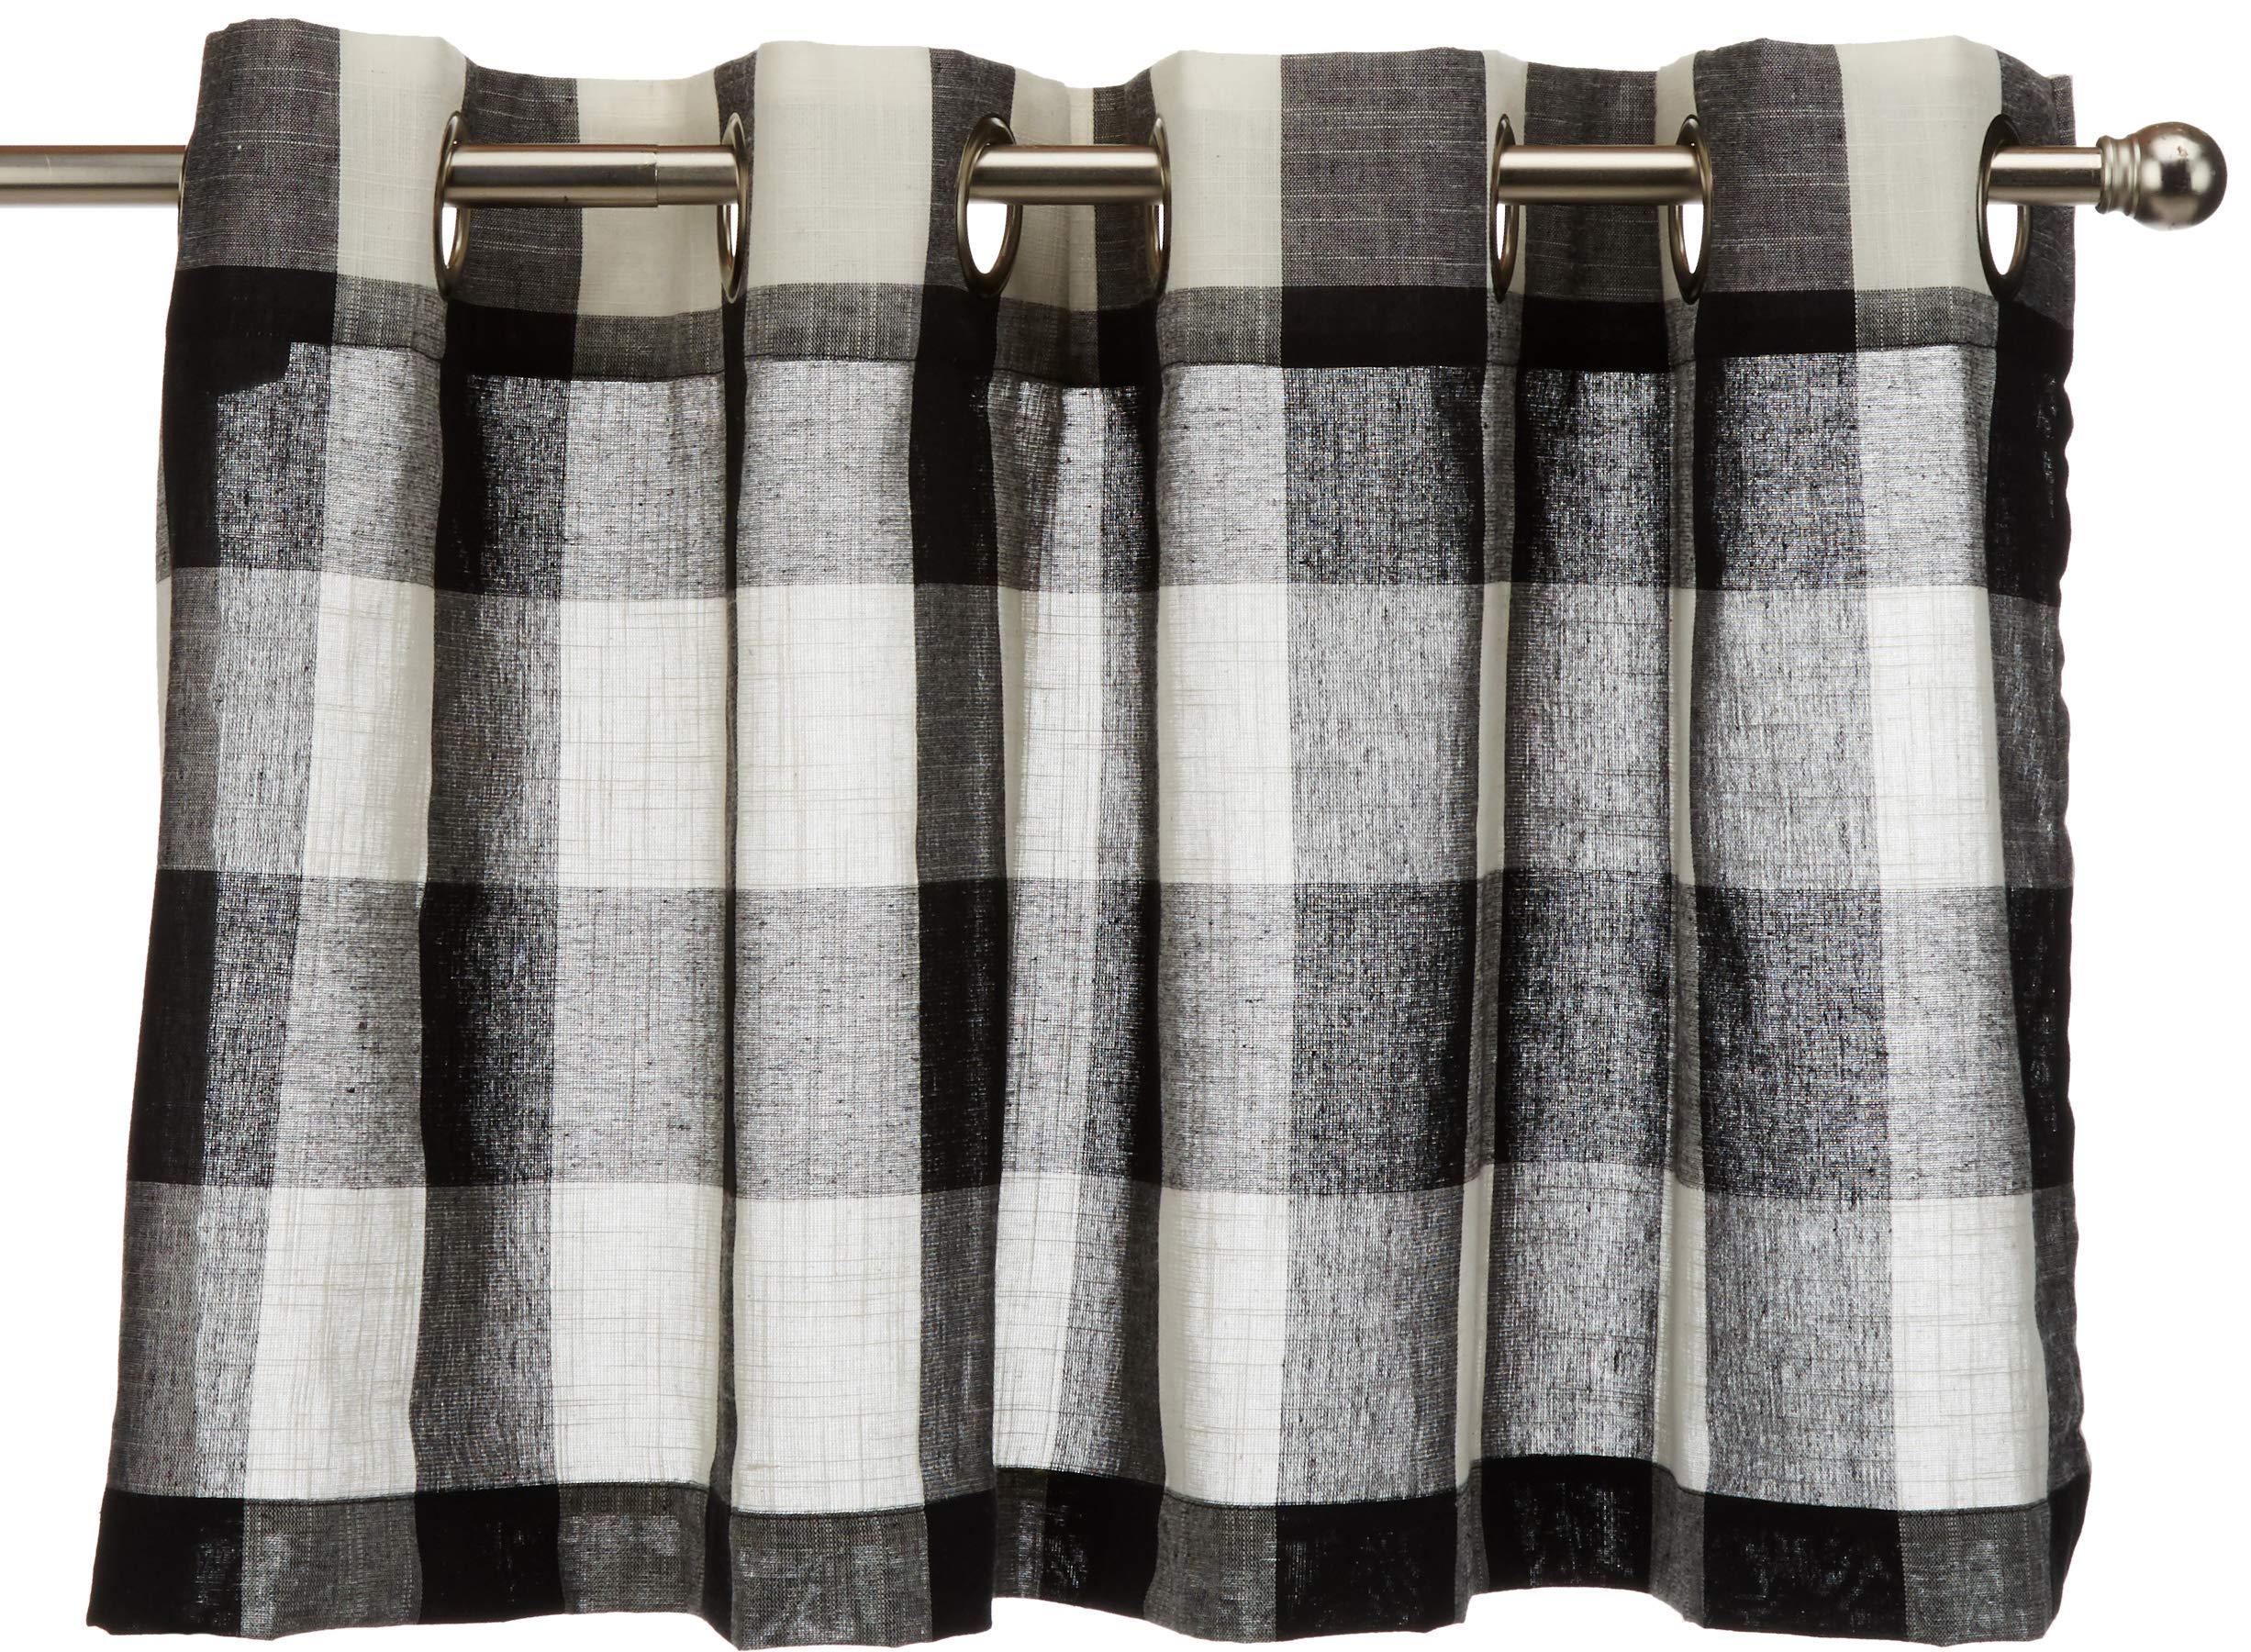 Lorraine Home Fashions 09570-V-00146 BLACK Courtyard Grommet Window Curtain Valance, Black, 53'' X 18'' by LORRAINE HOME FASHIONS